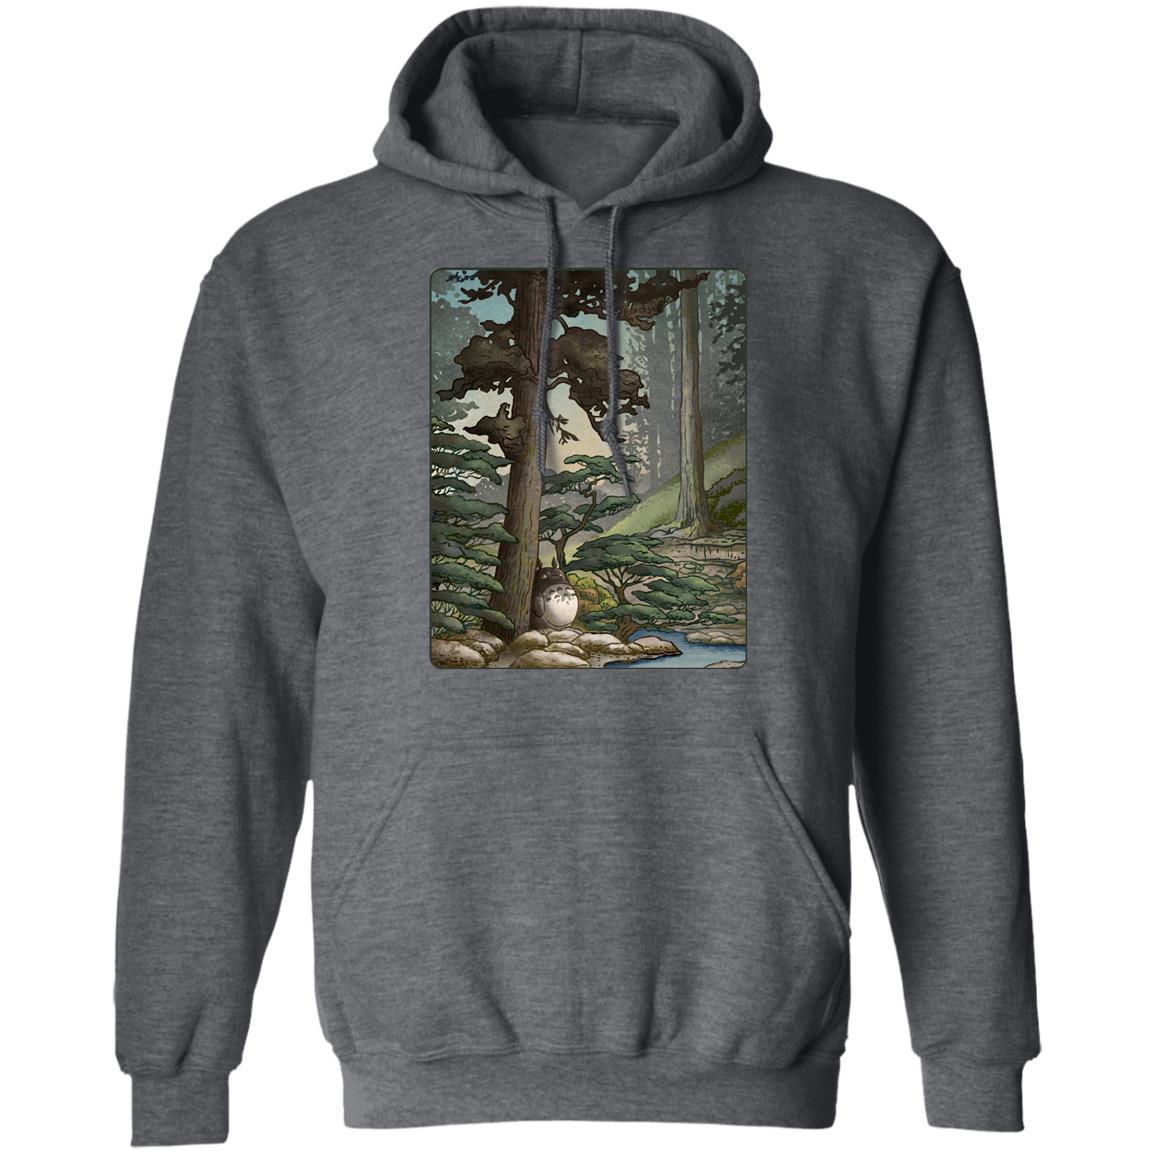 Totoro in the Landscape Hoodie